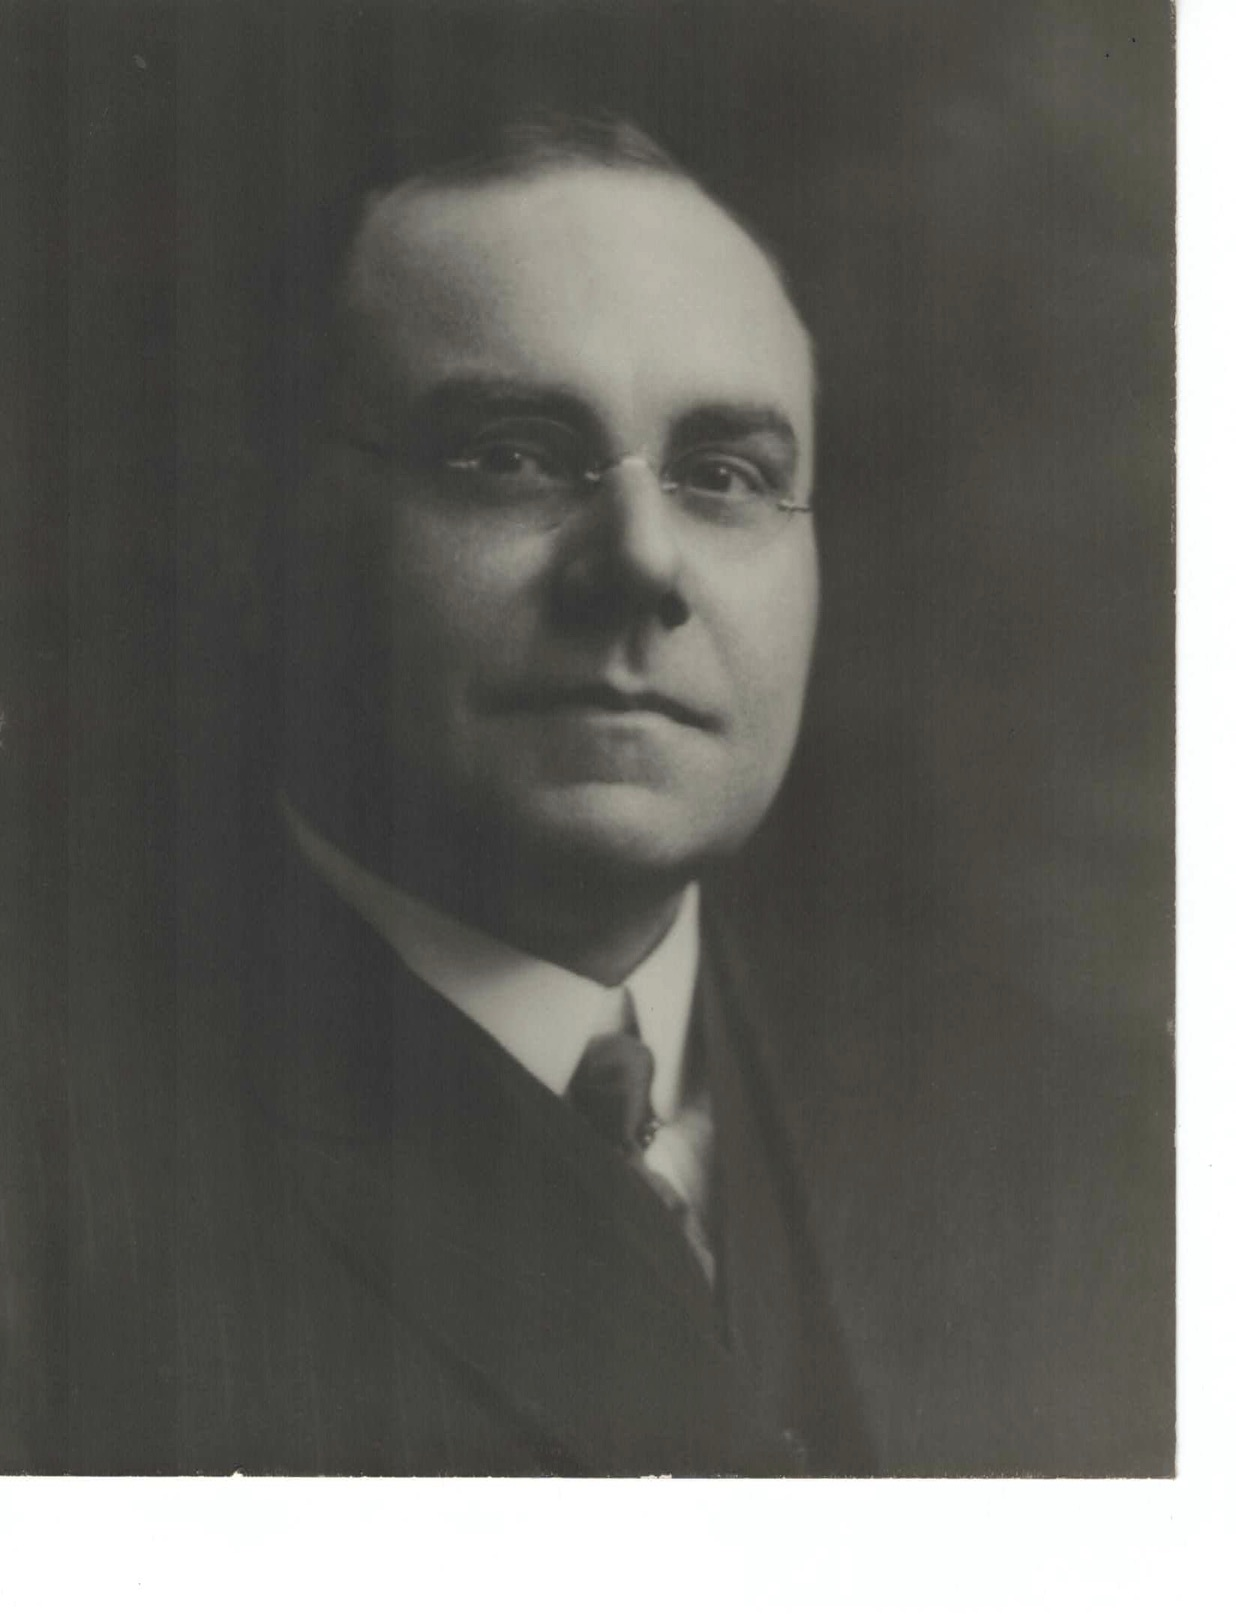 WORRAL WILSON 1916-17